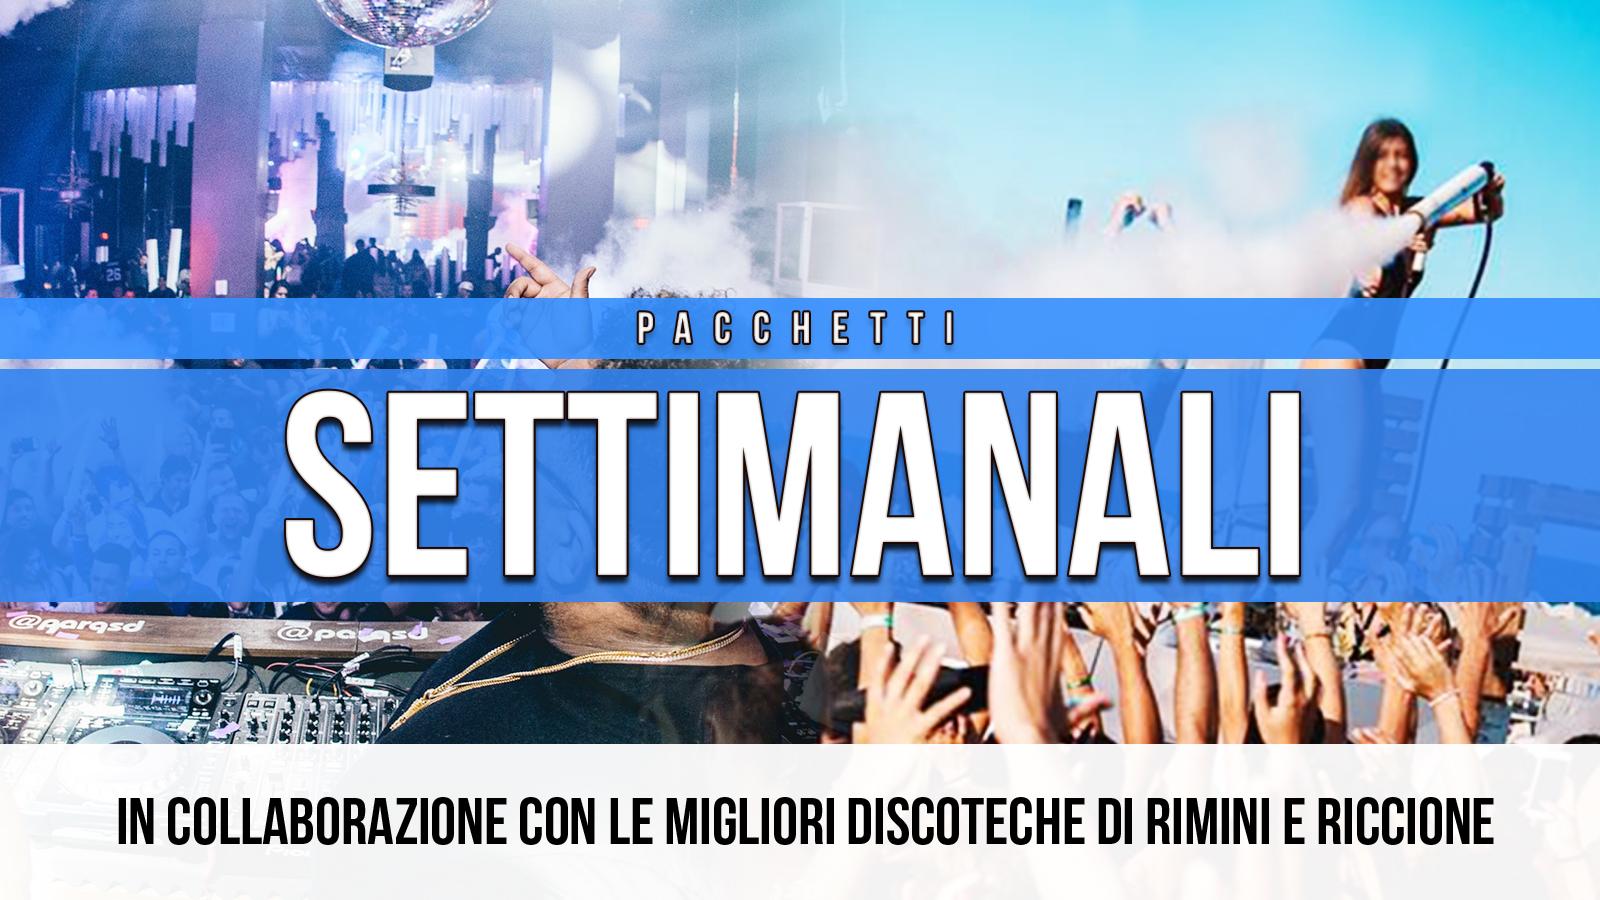 Pacchetti Week End Riccione Rimini Hotel + Discoteche